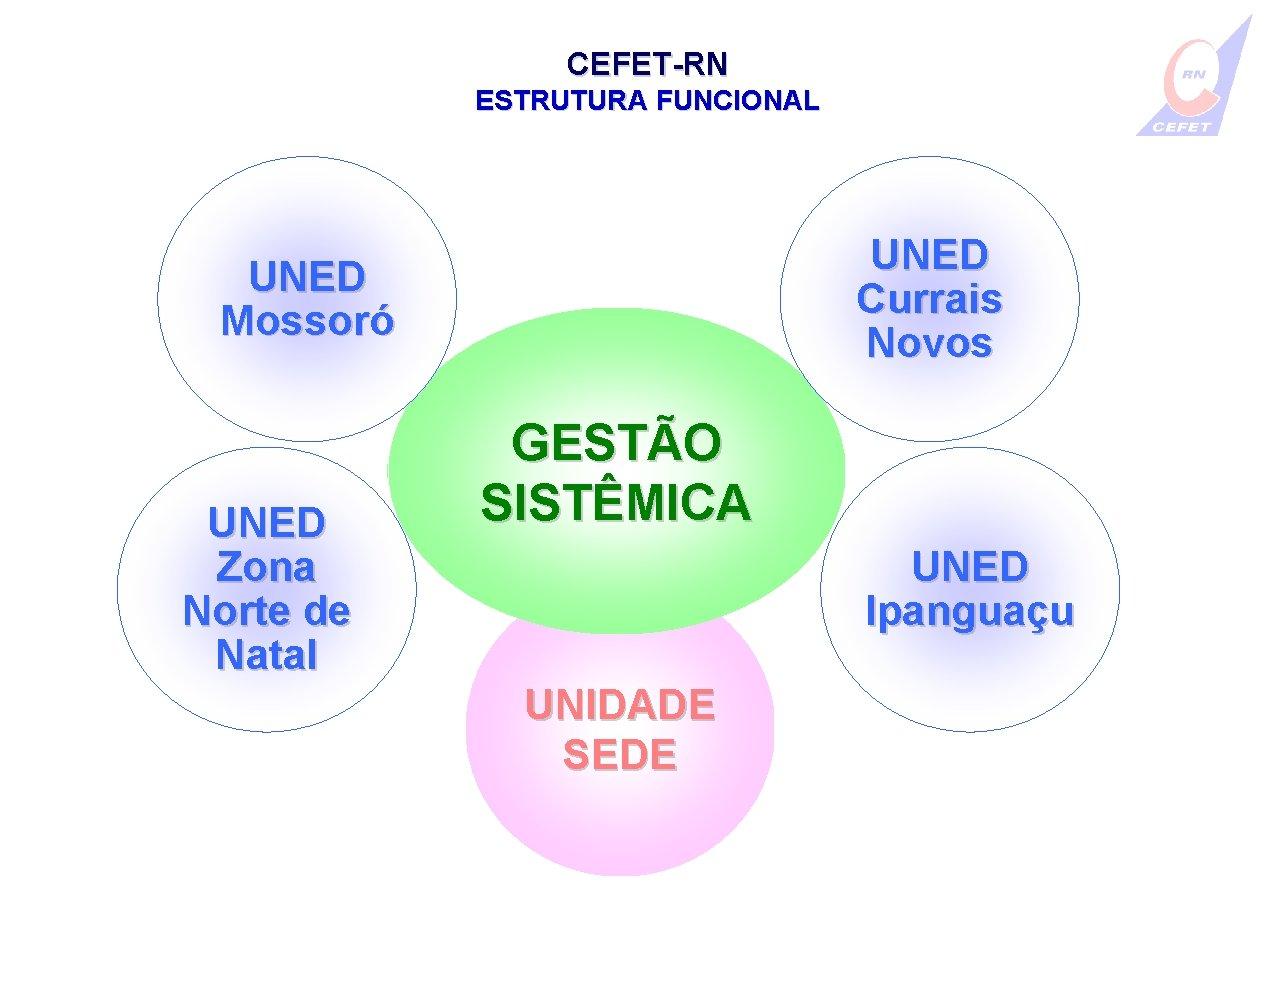 CEFET-RN ESTRUTURA FUNCIONAL UNED Currais Novos UNED Mossoró UNED Zona Norte de Natal GESTÃO